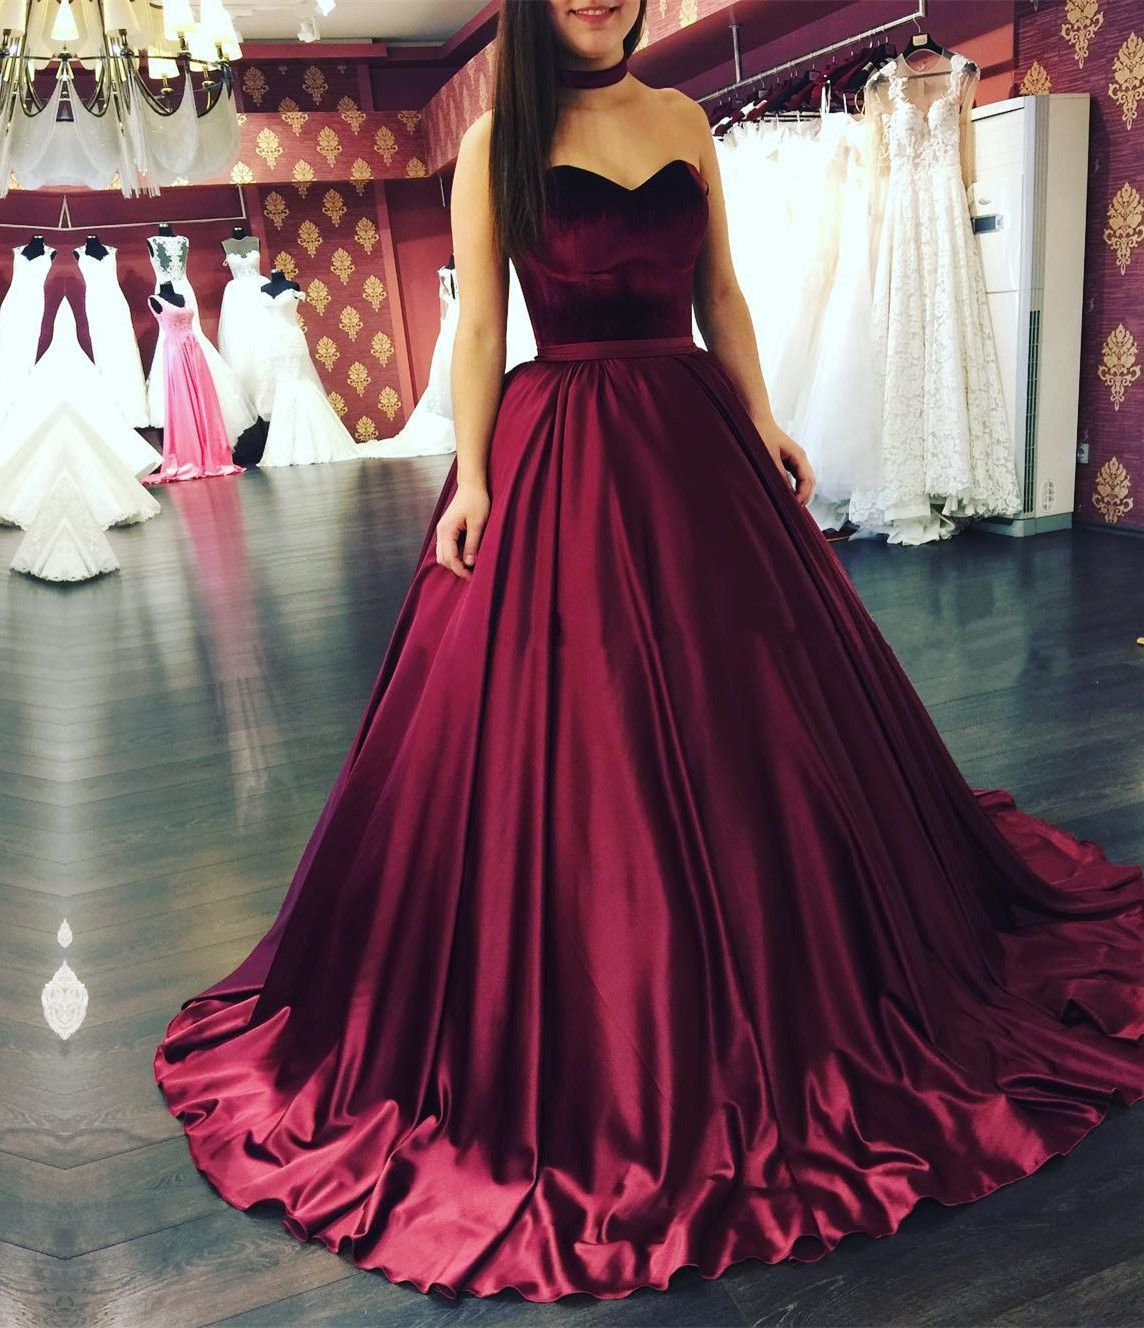 custom made wedding dresses photo - 1